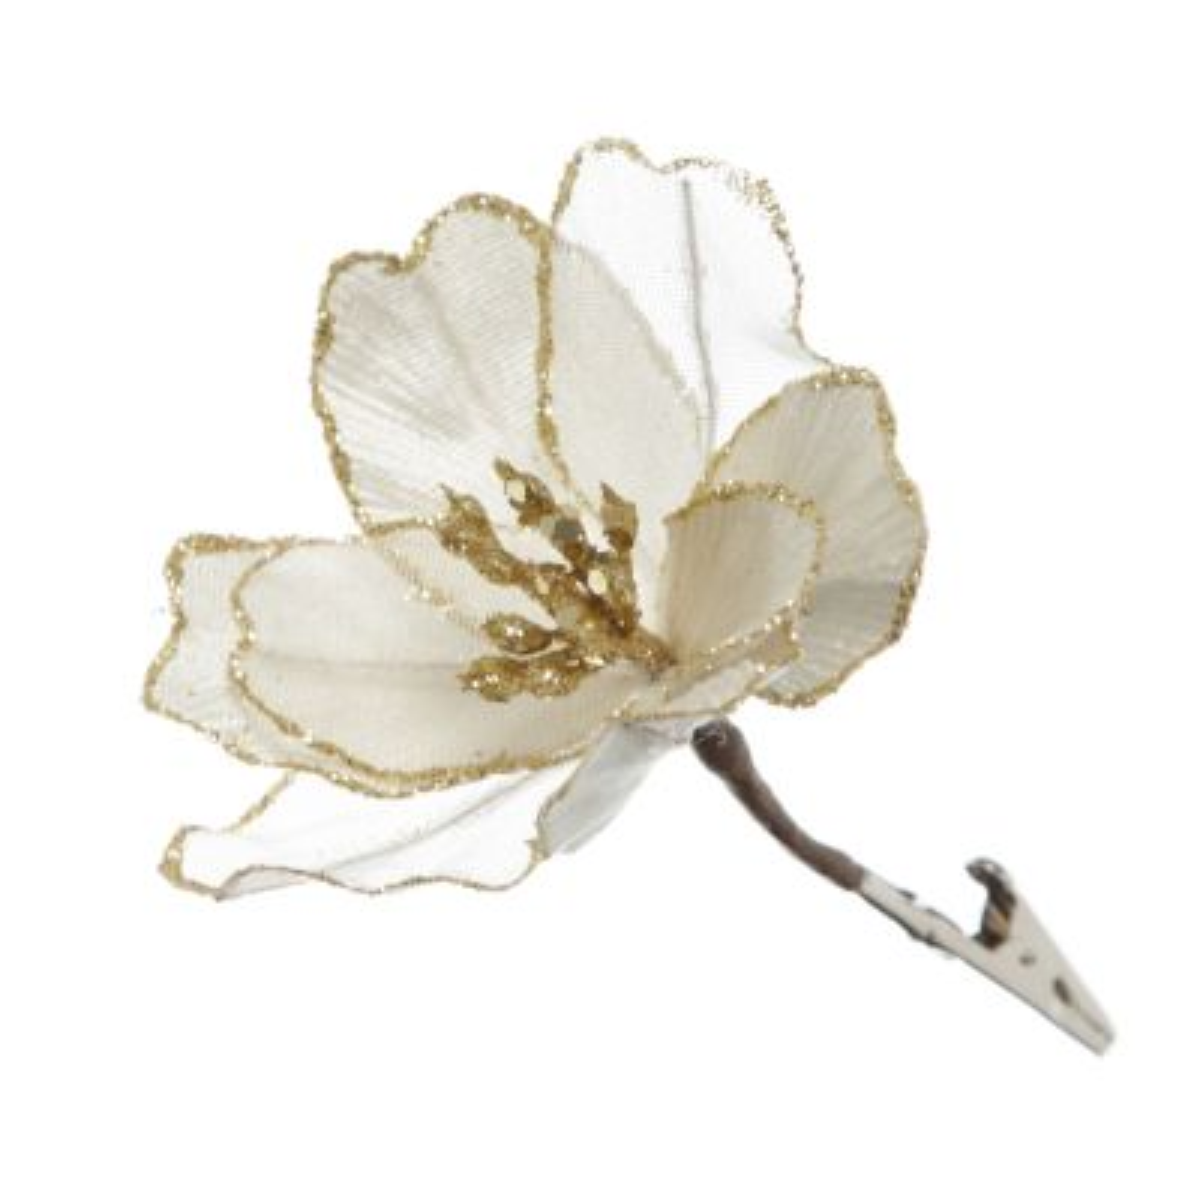 Champagne Magnolia Flower with Gold Glitter Trim